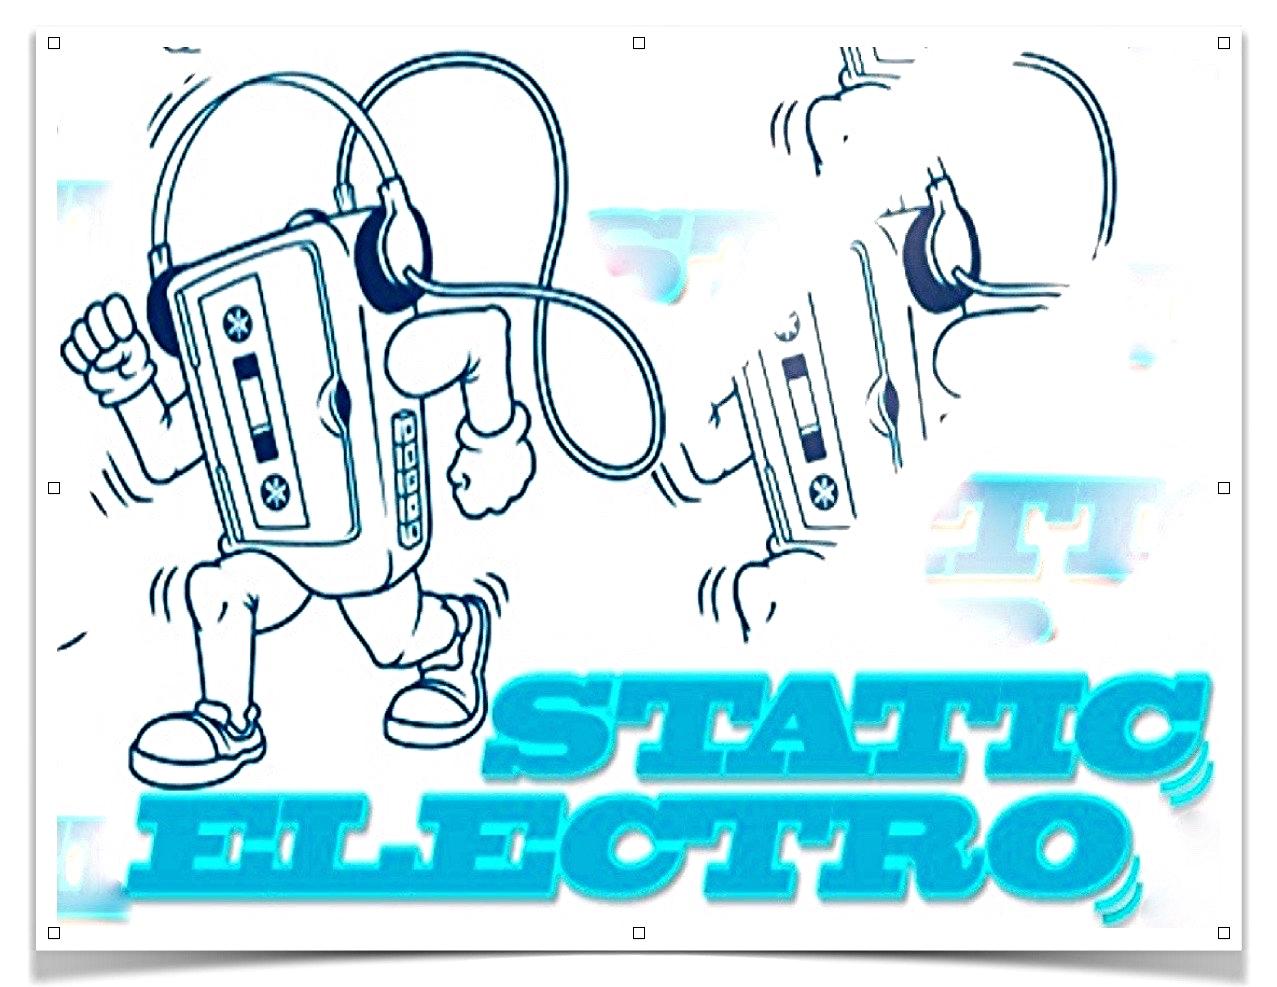 Static Electro Messy poster image 3.jpg